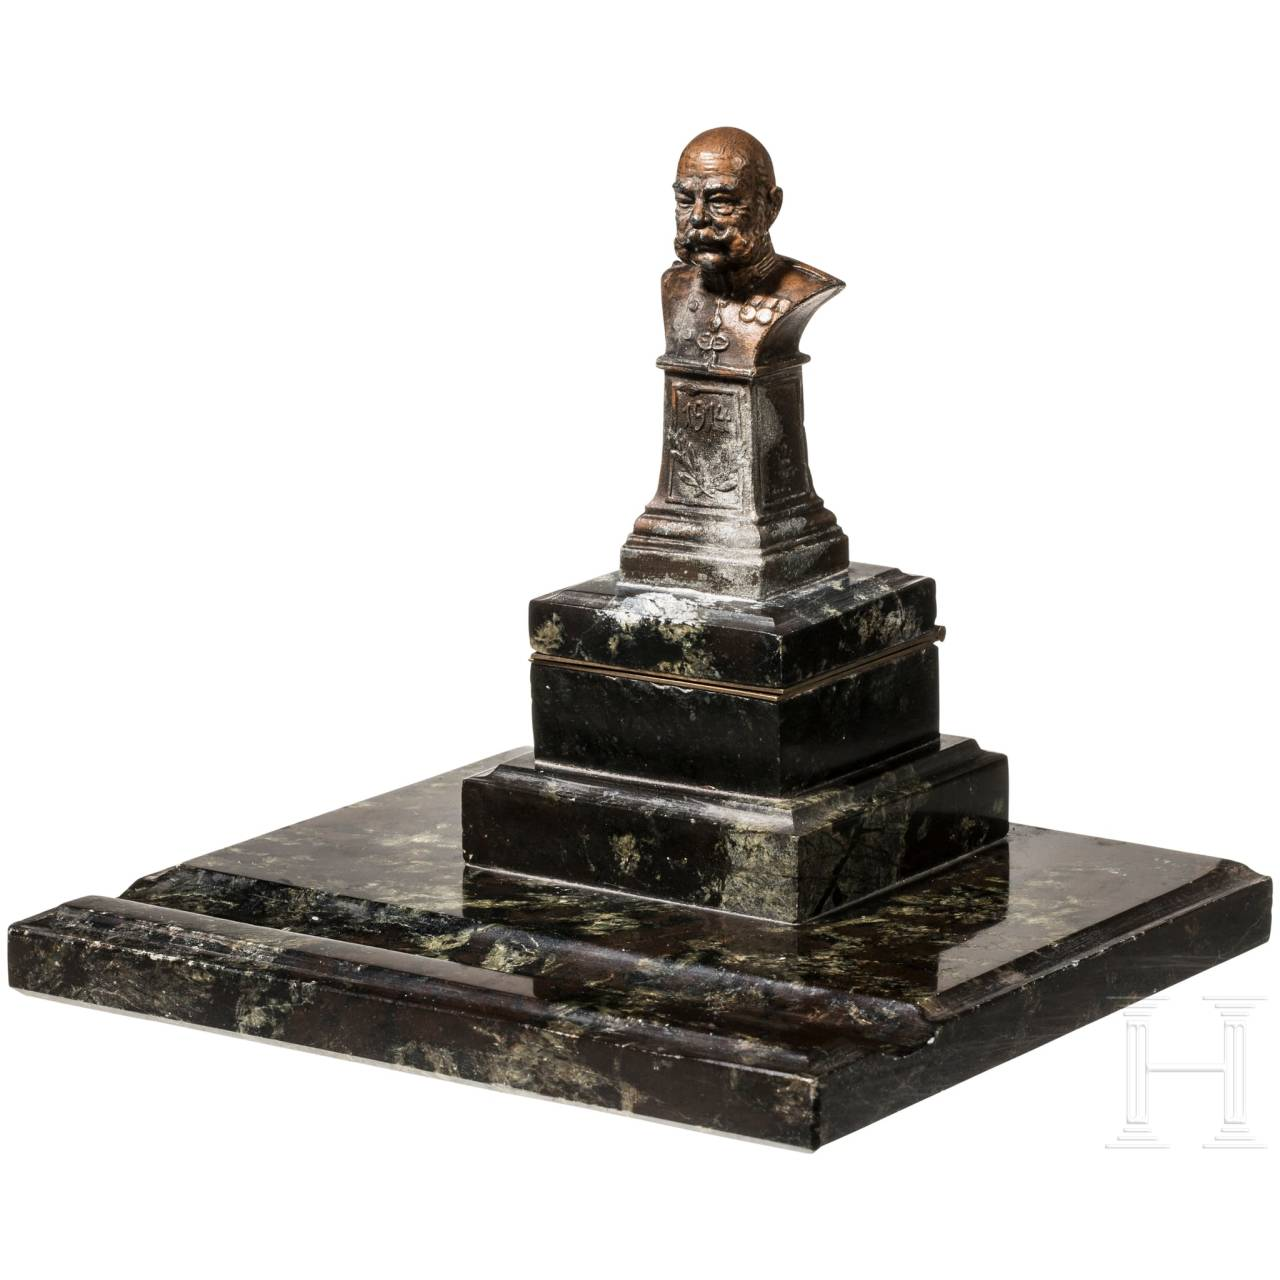 Emperor Franz Joseph I of Austria - desk set with small emperor bust